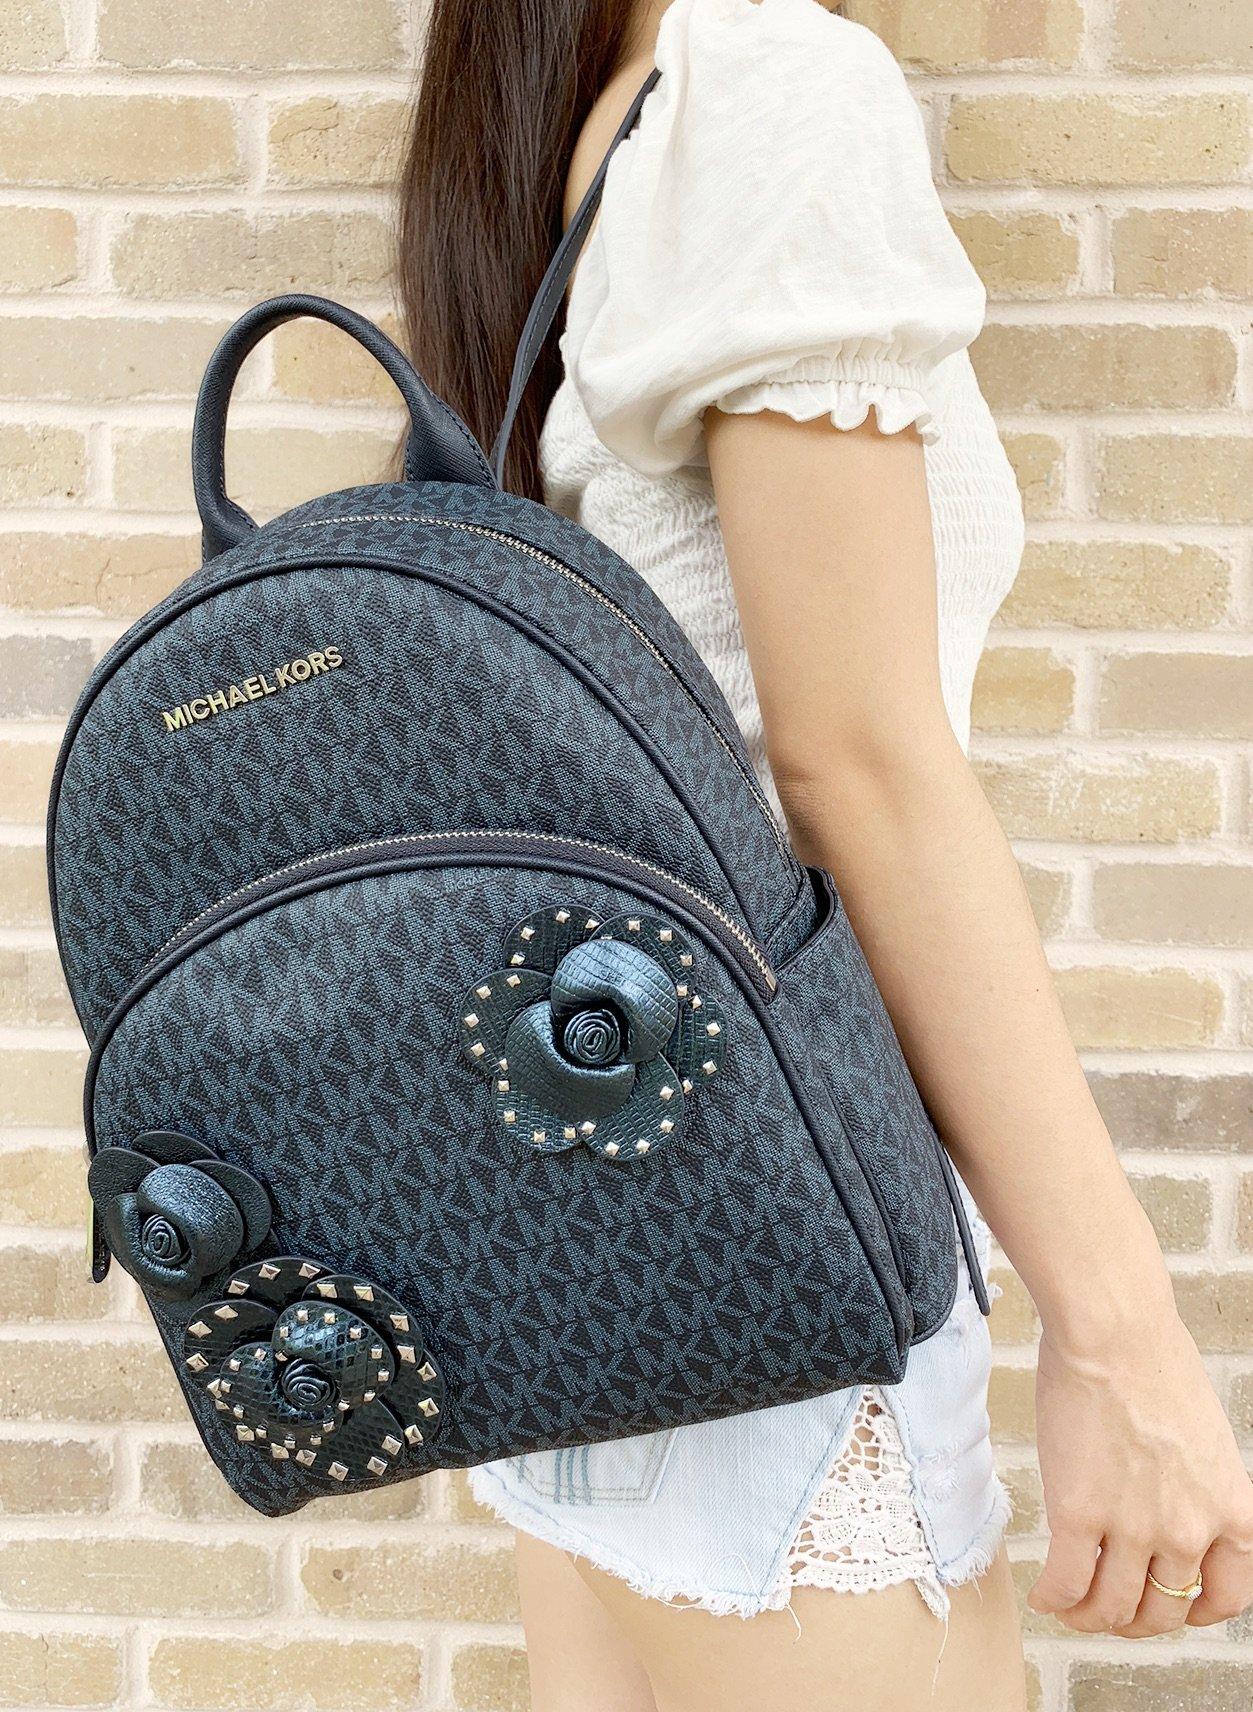 4a4e5e28fadb Details about Michael Kors Abbey Medium Backpack Admiral Blue MK Signature  Flower School Bag